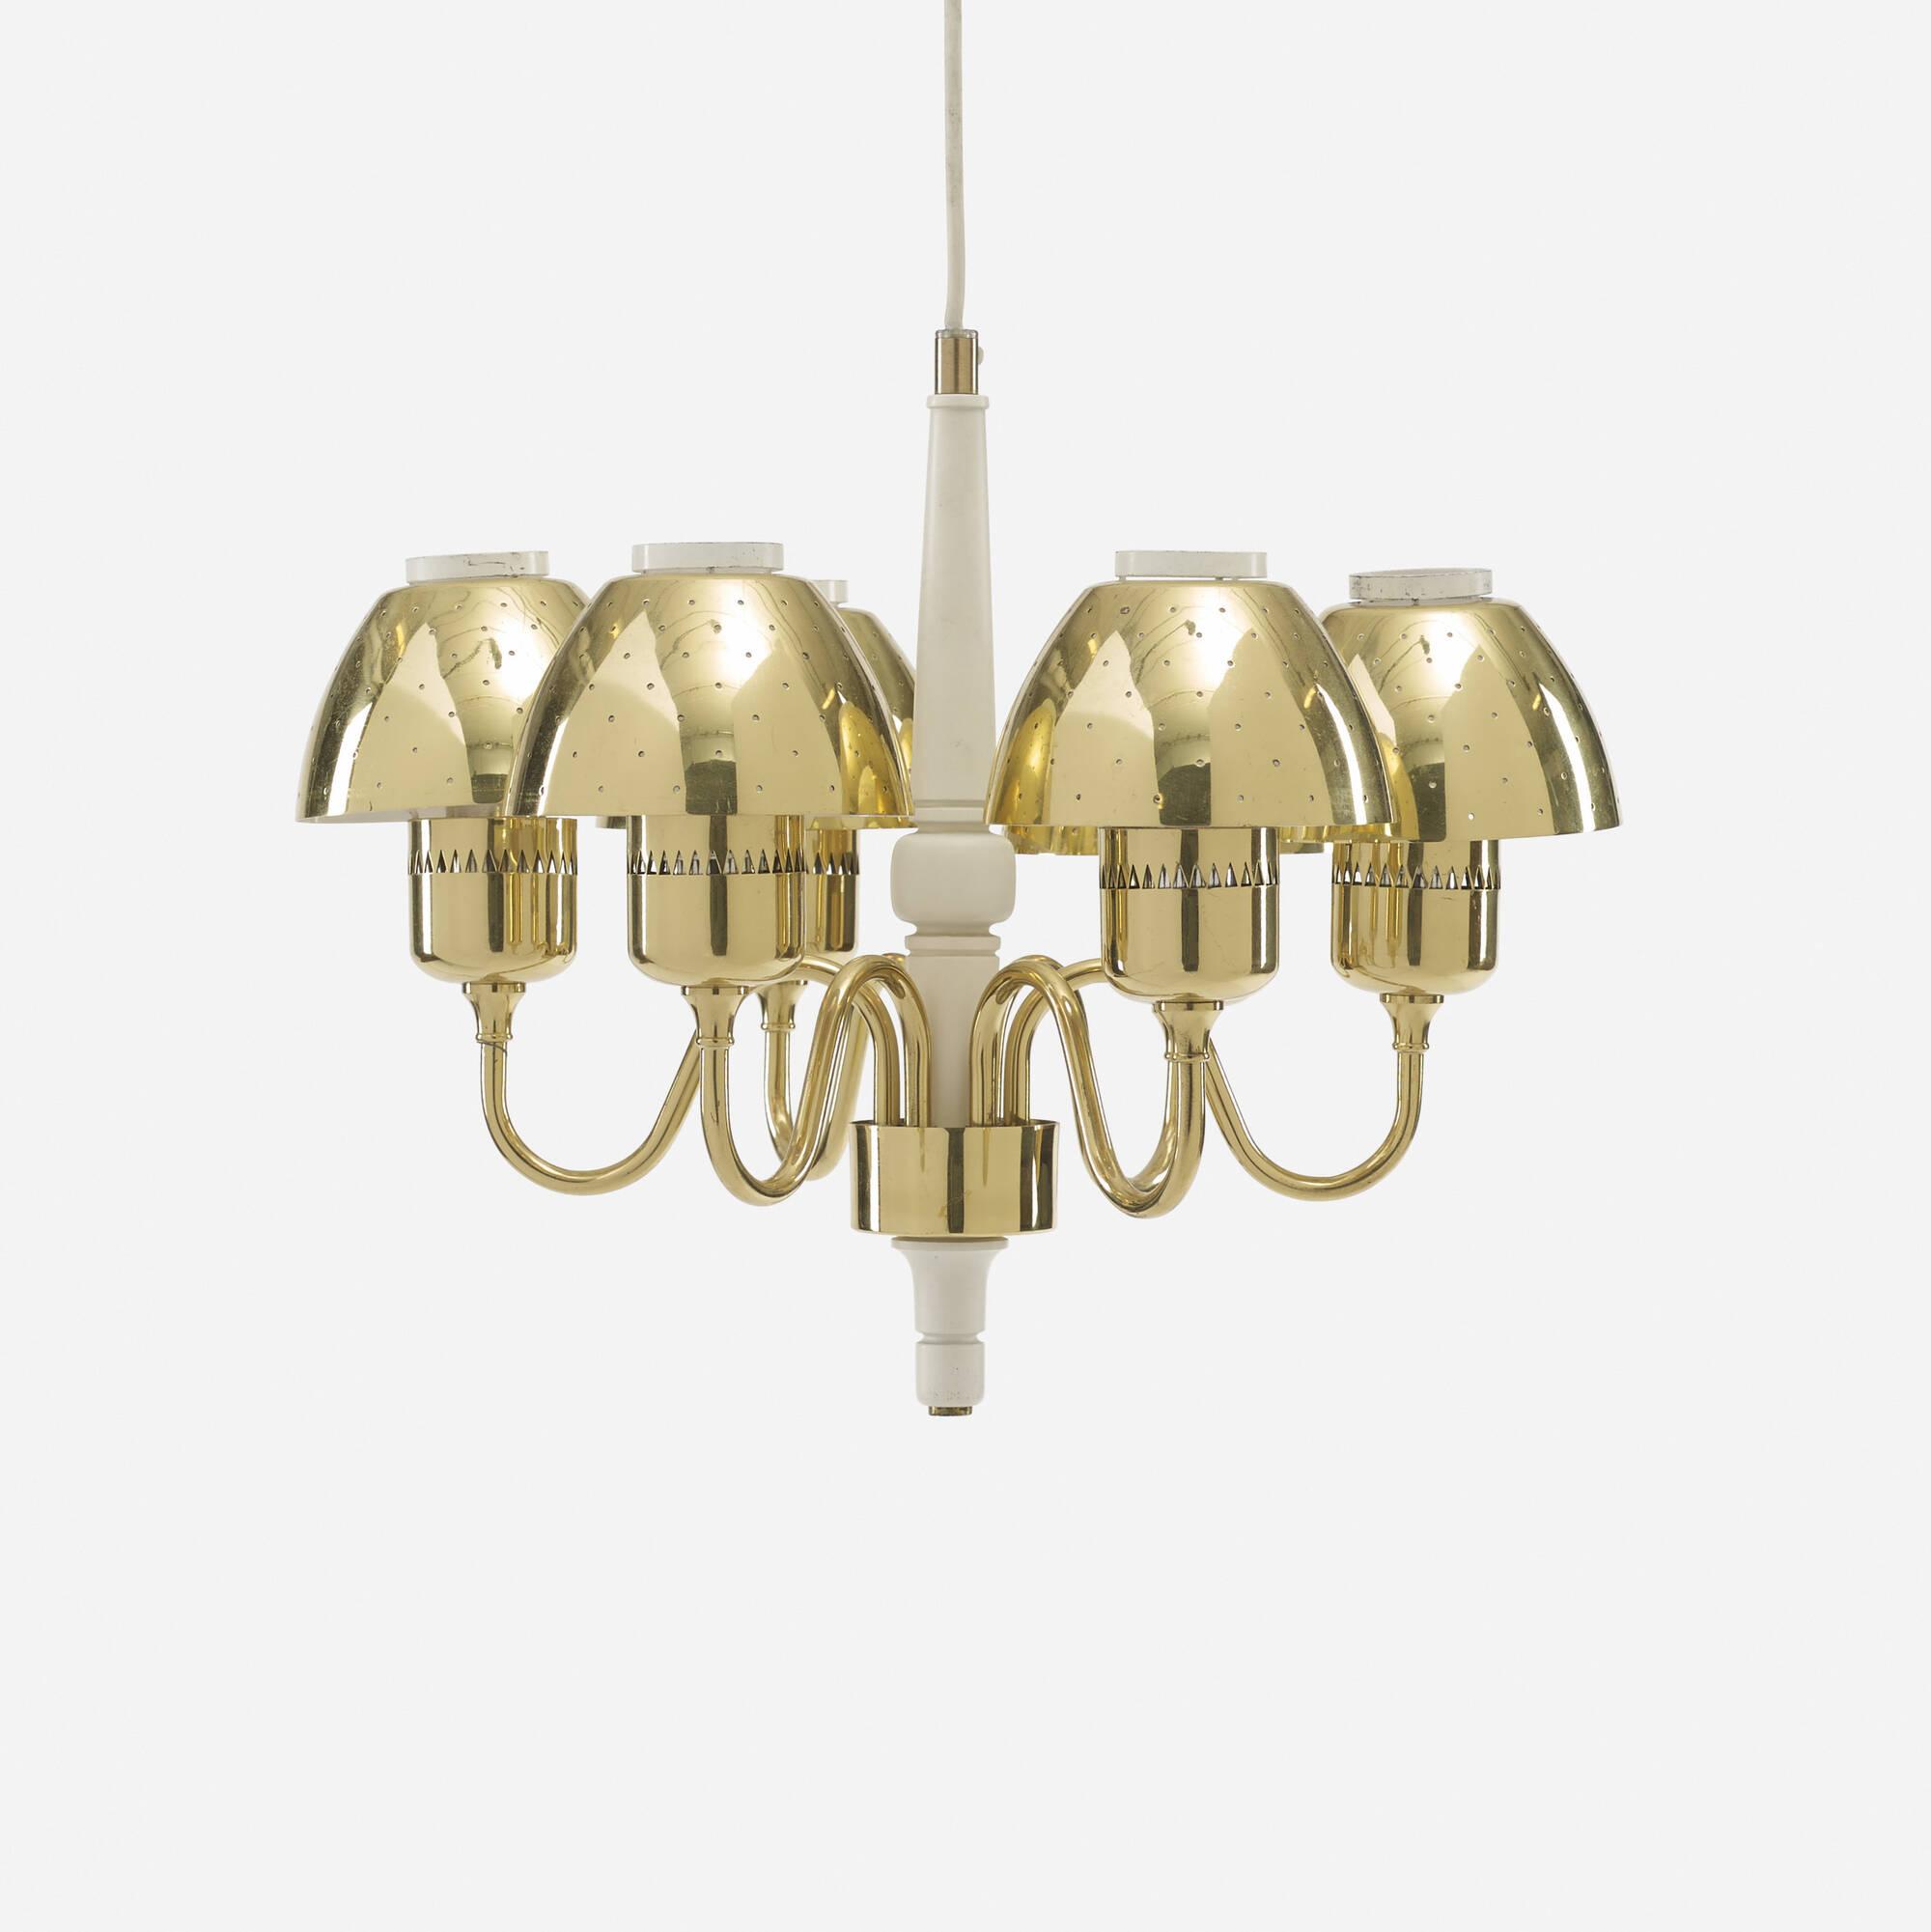 155: Hans-Agne Jakobsson / chandelier (1 of 1)